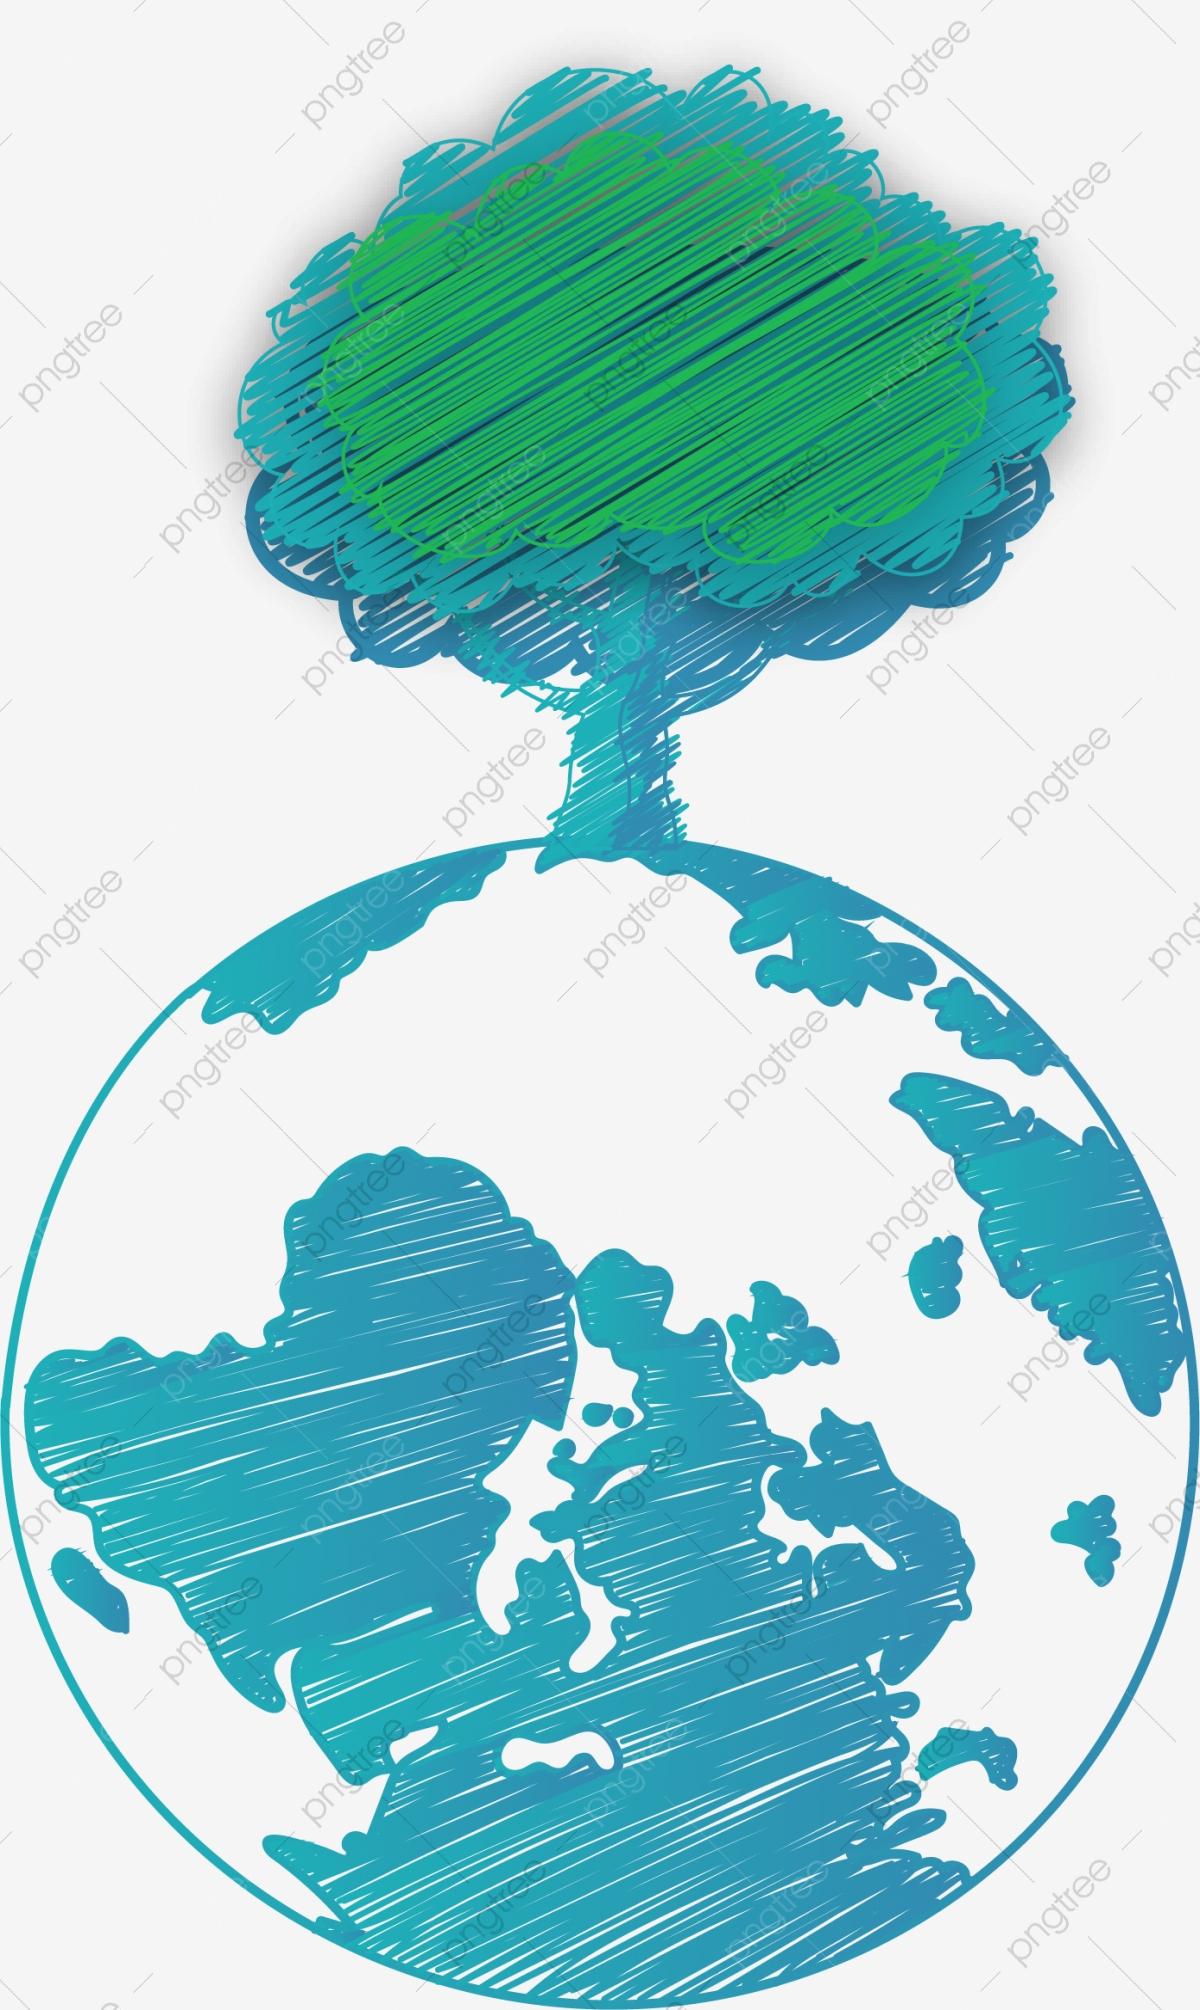 Globe clipart tree. Earth creative green png